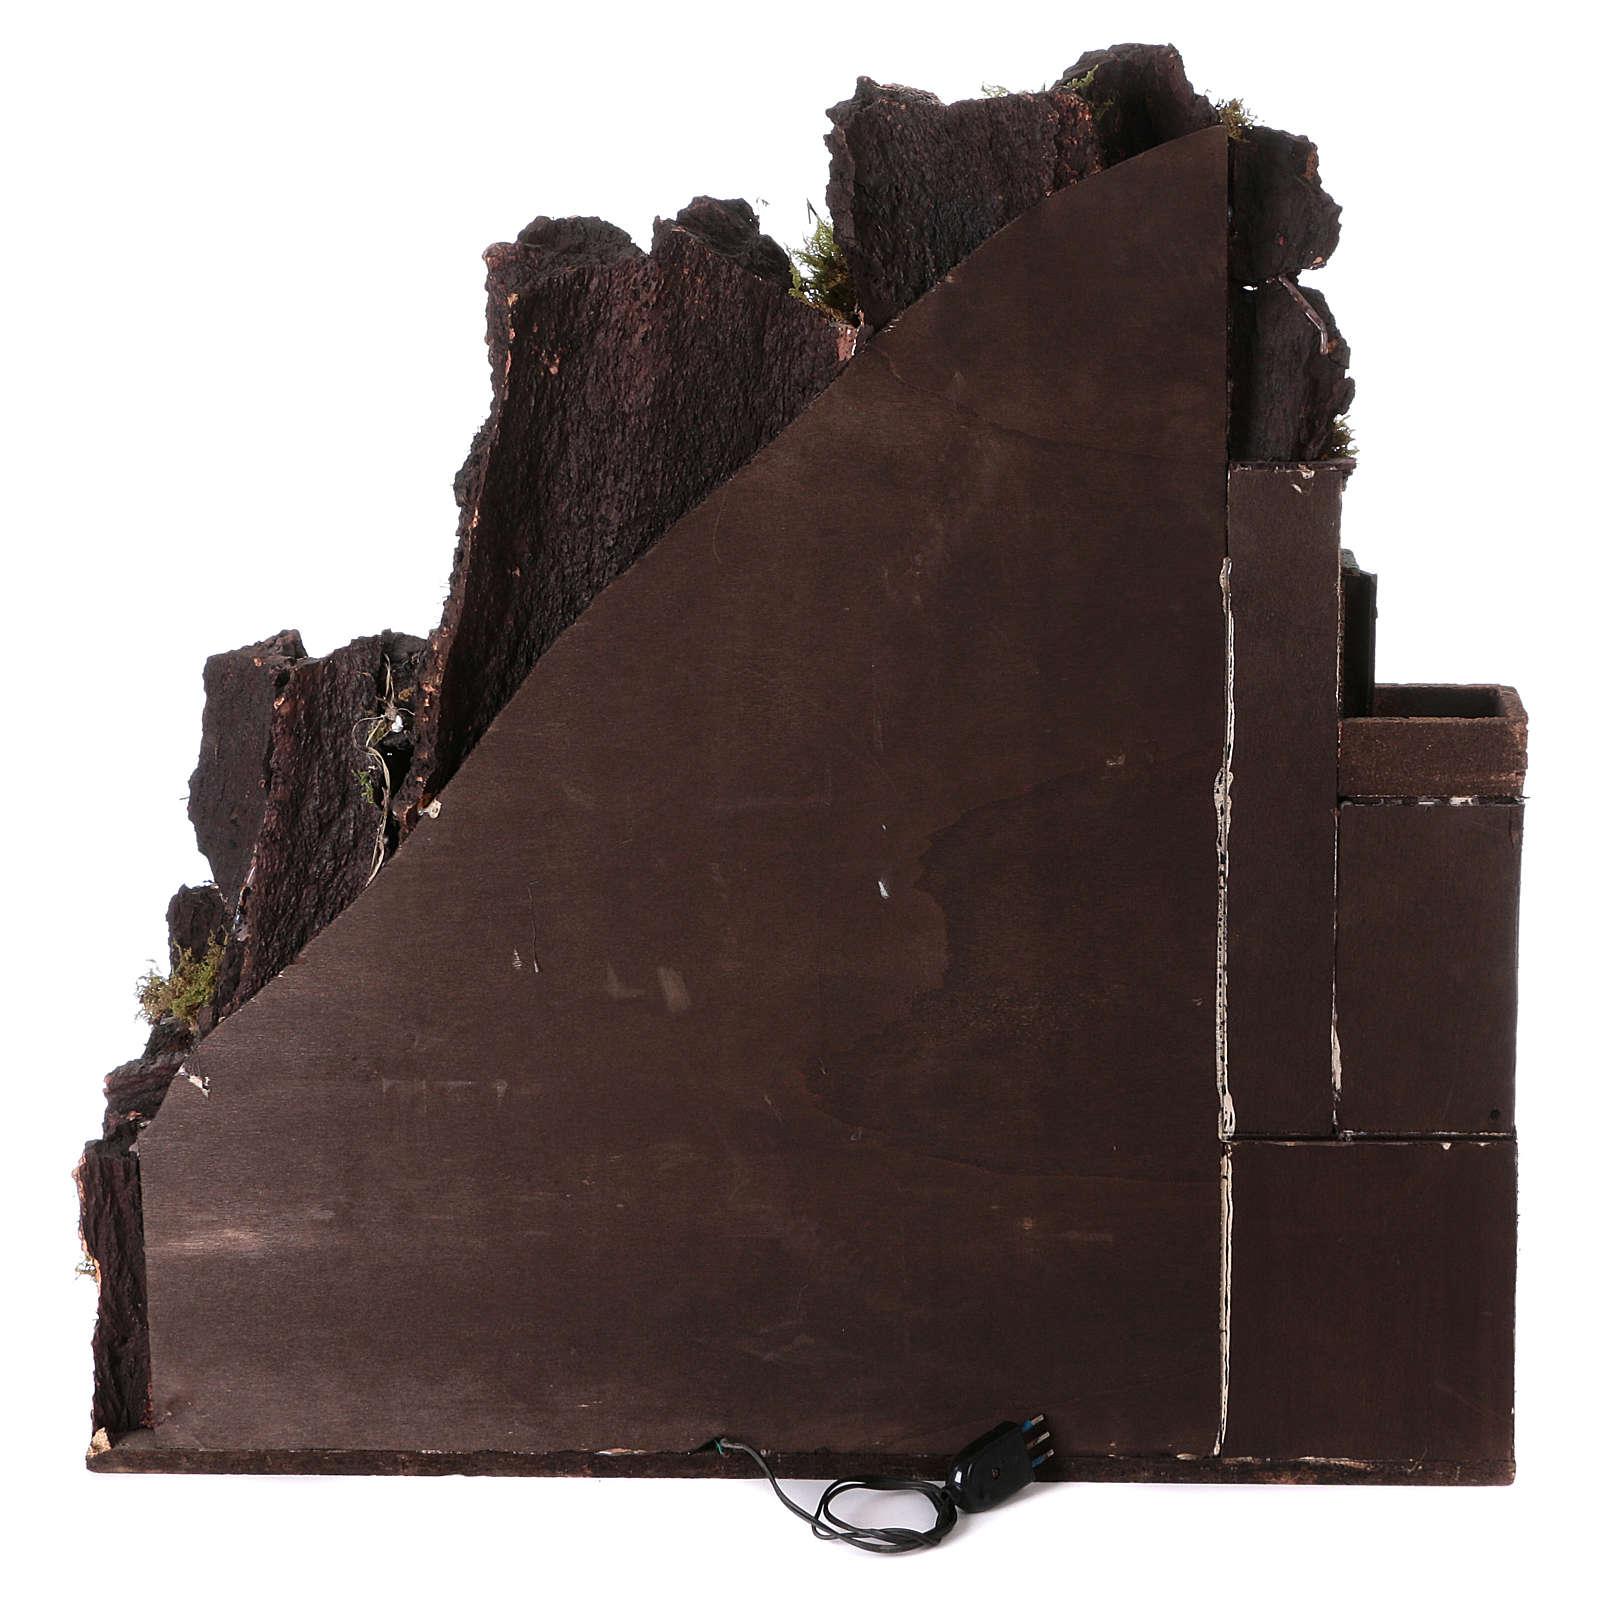 Aldea belén napolitano con molino 78x70x50 cm 4